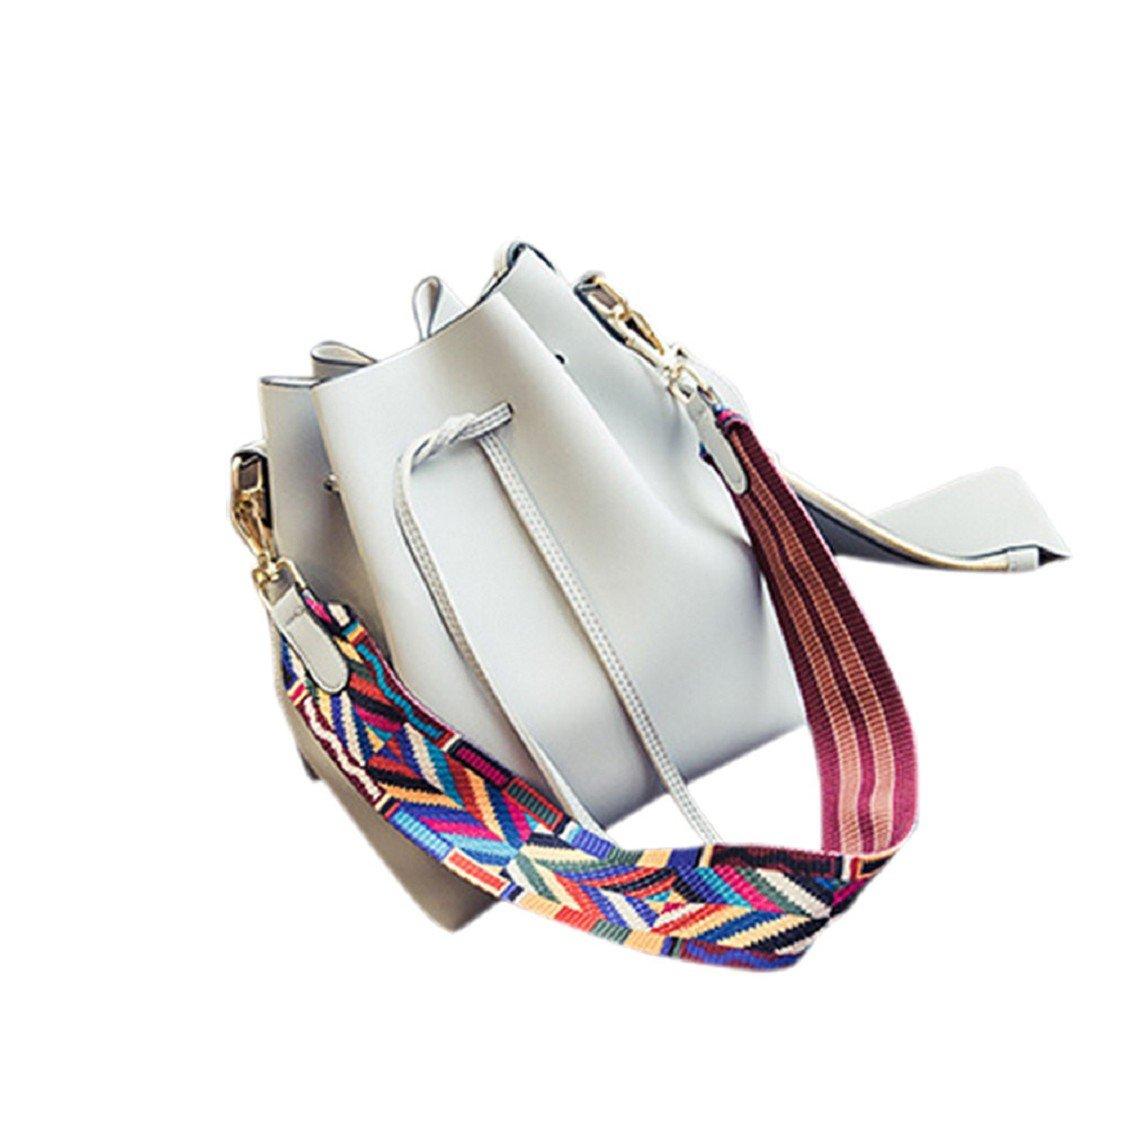 d95e924fe76a Amazon.com: Egmy® 2016 2PC Women Retro Drawstring Bucket Handbag ...